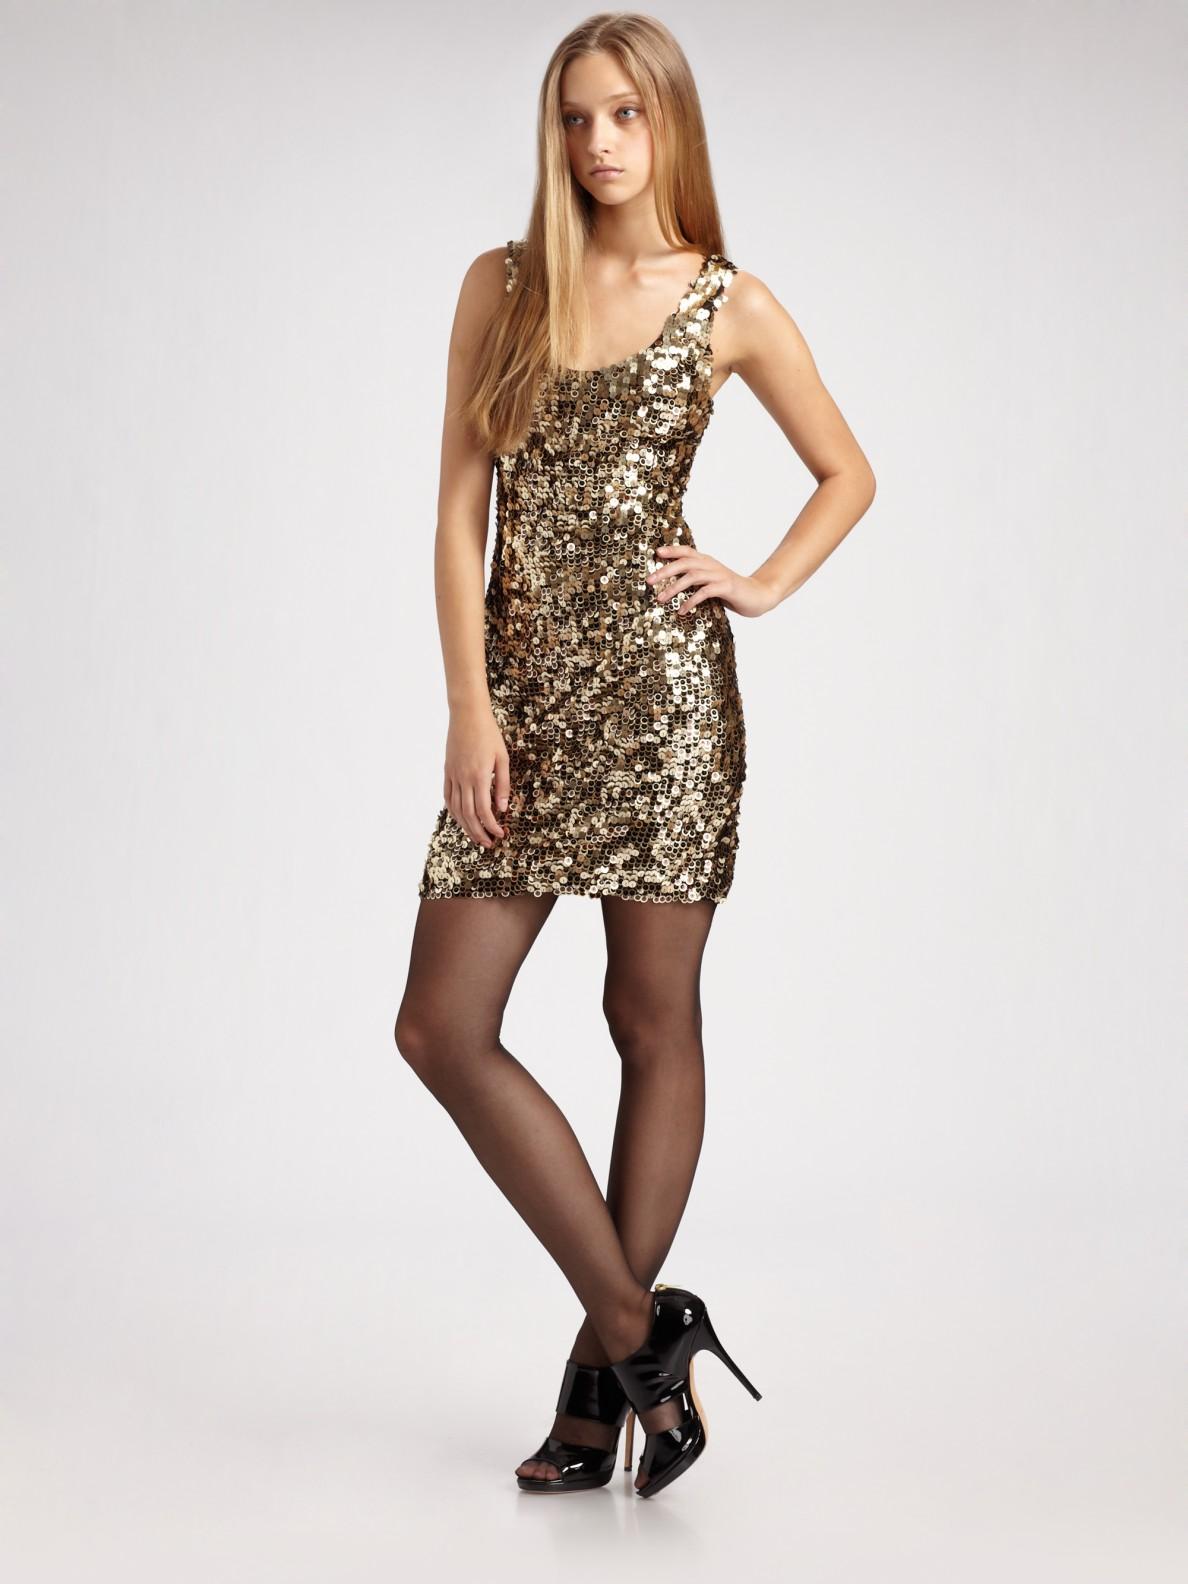 All Saints Gold Sequin Dress